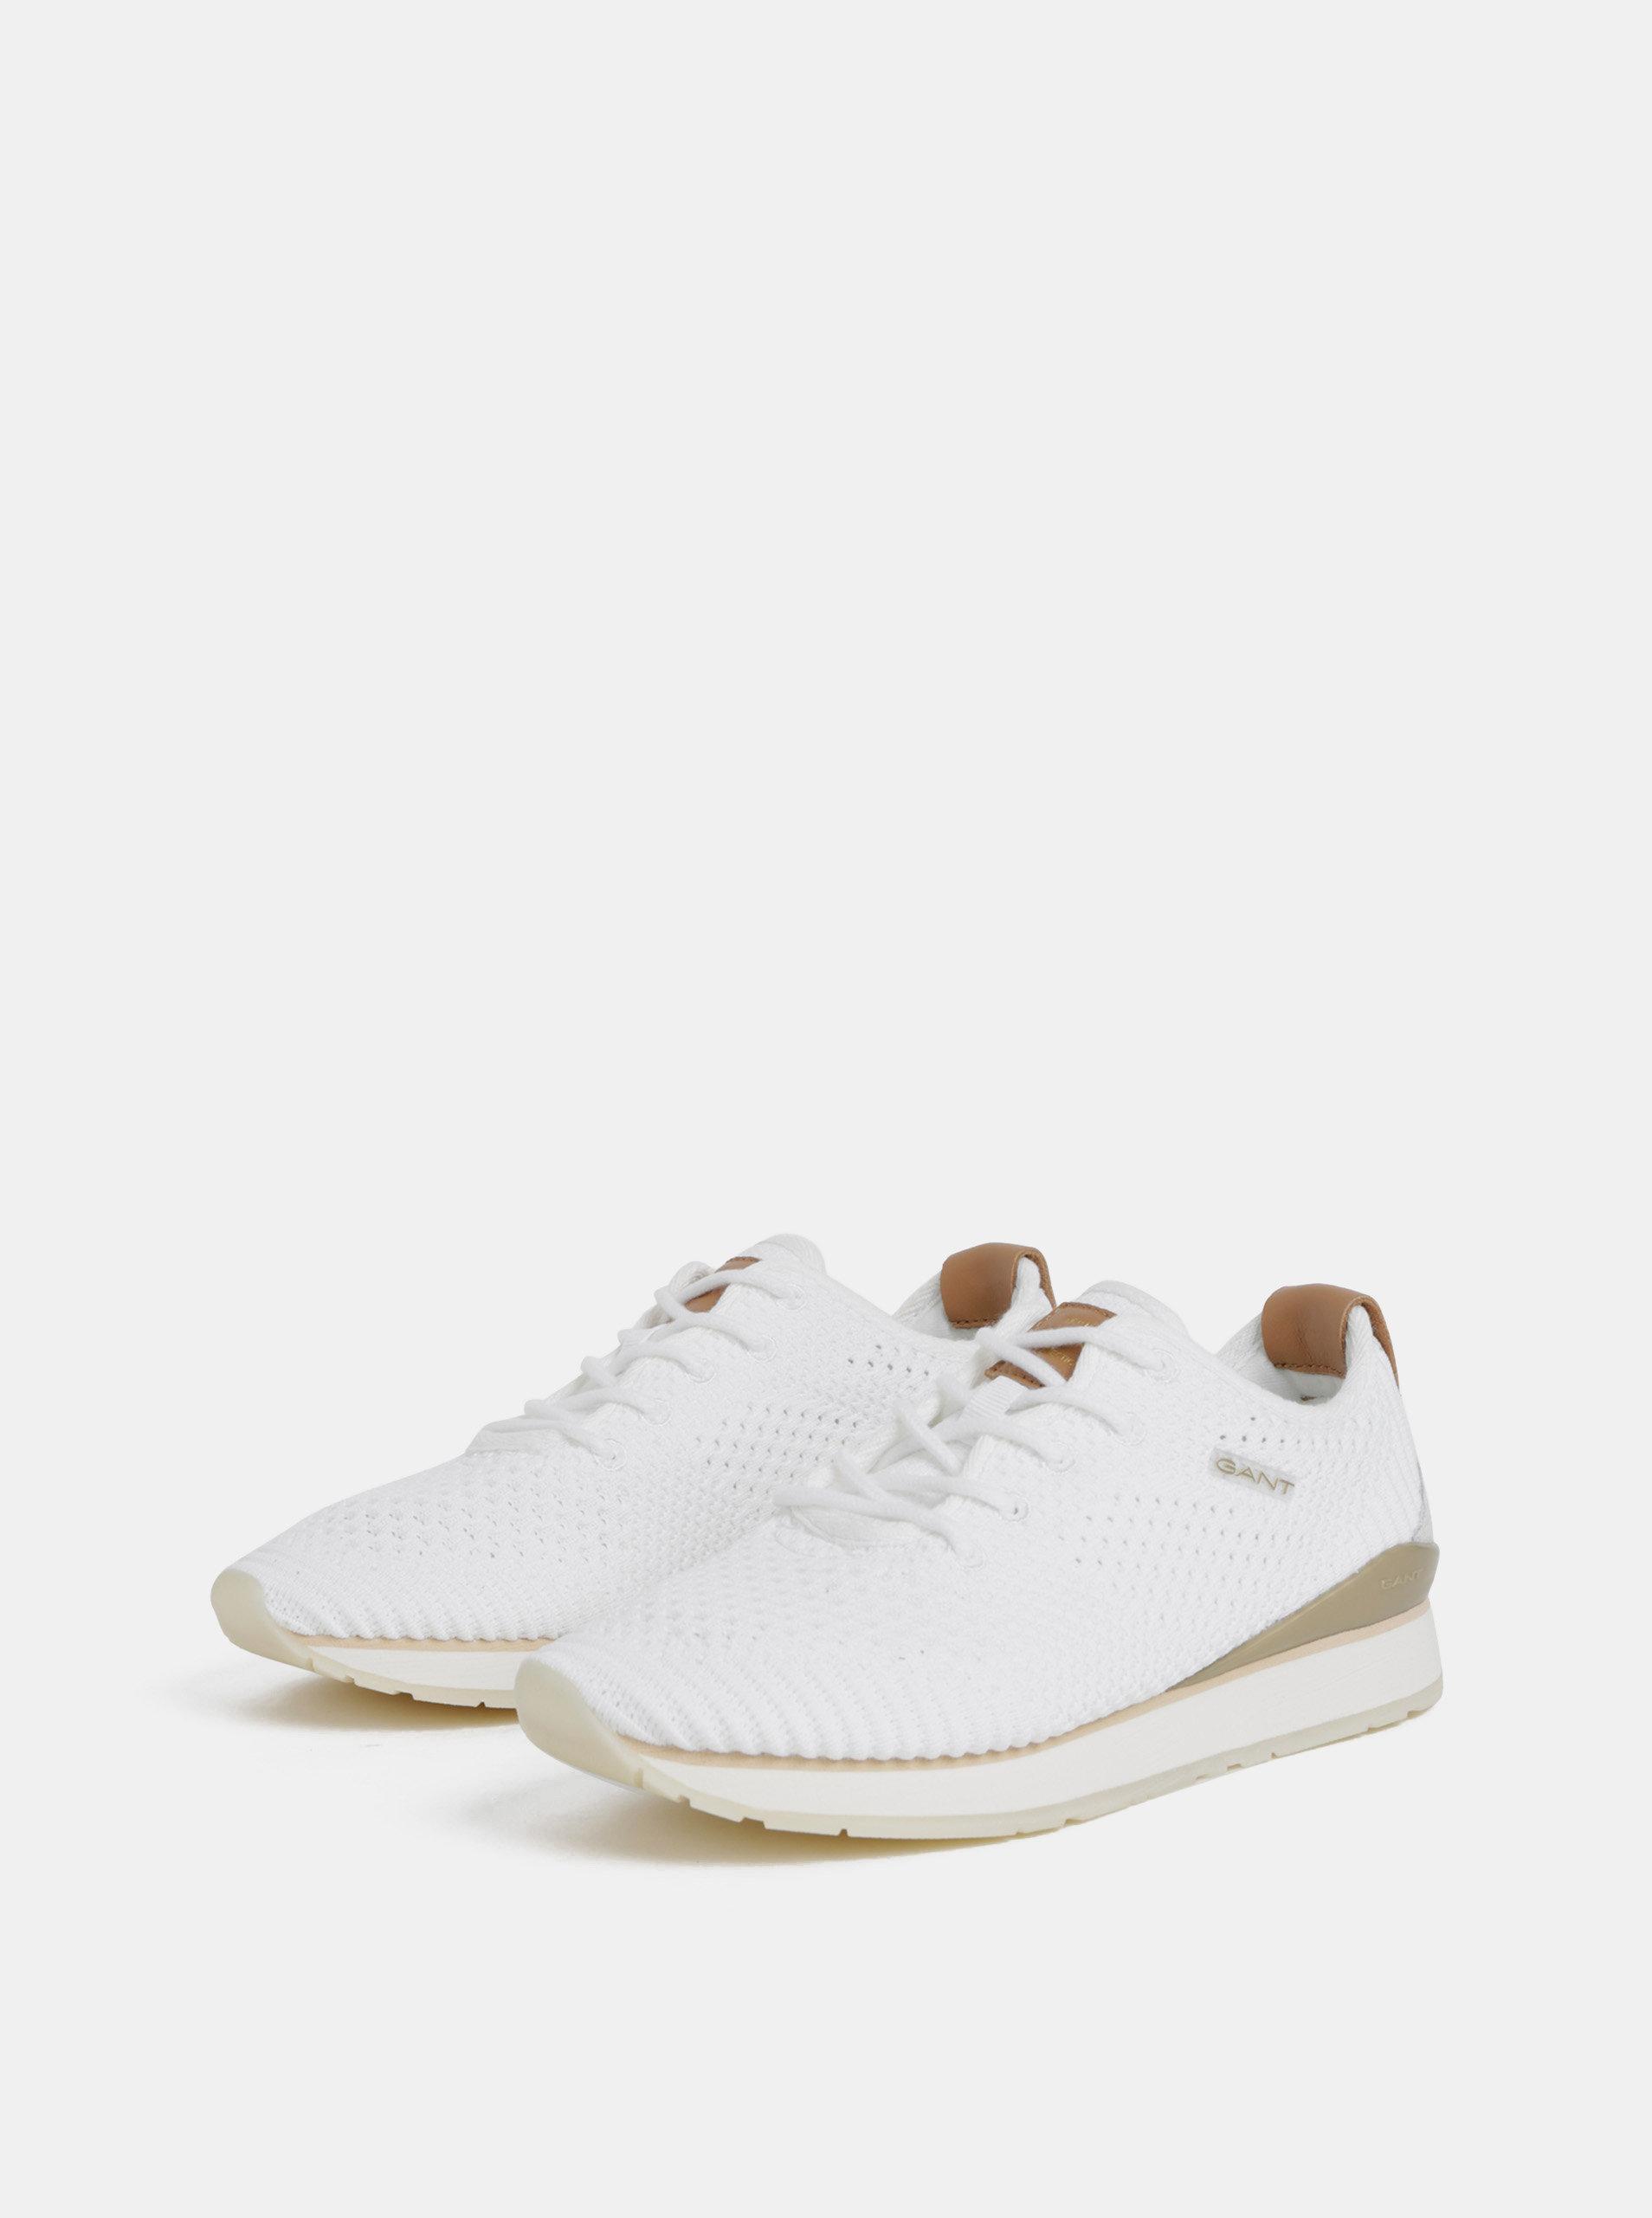 48028b2257788 Biele dámske tenisky s koženými detailmi GANT Linda | ZOOT.sk